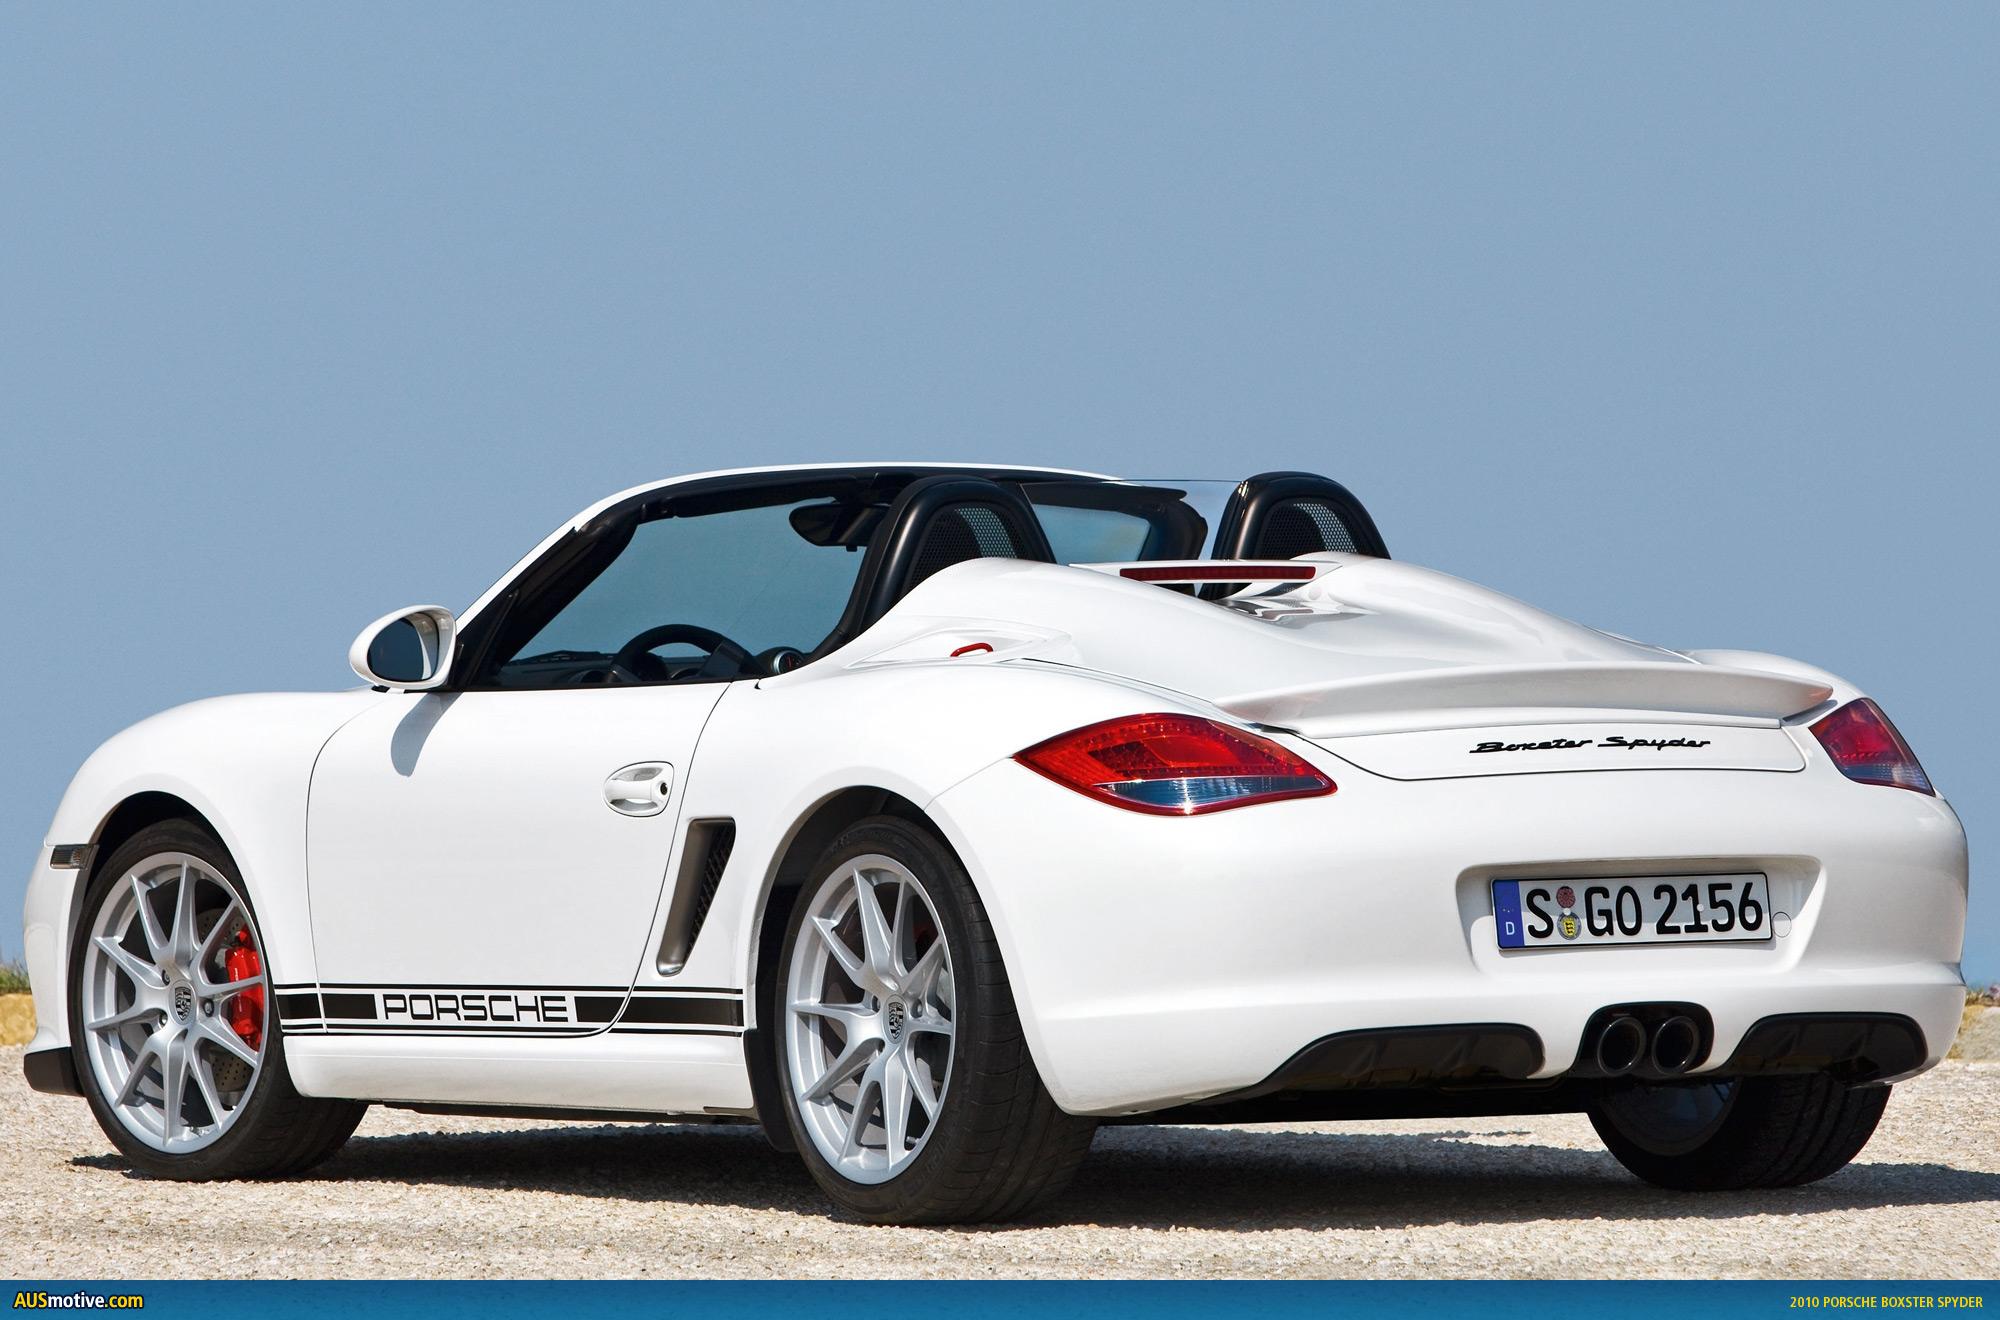 AUSmotive.com » Sneak peek: 2010 Porsche Boxster Spyder